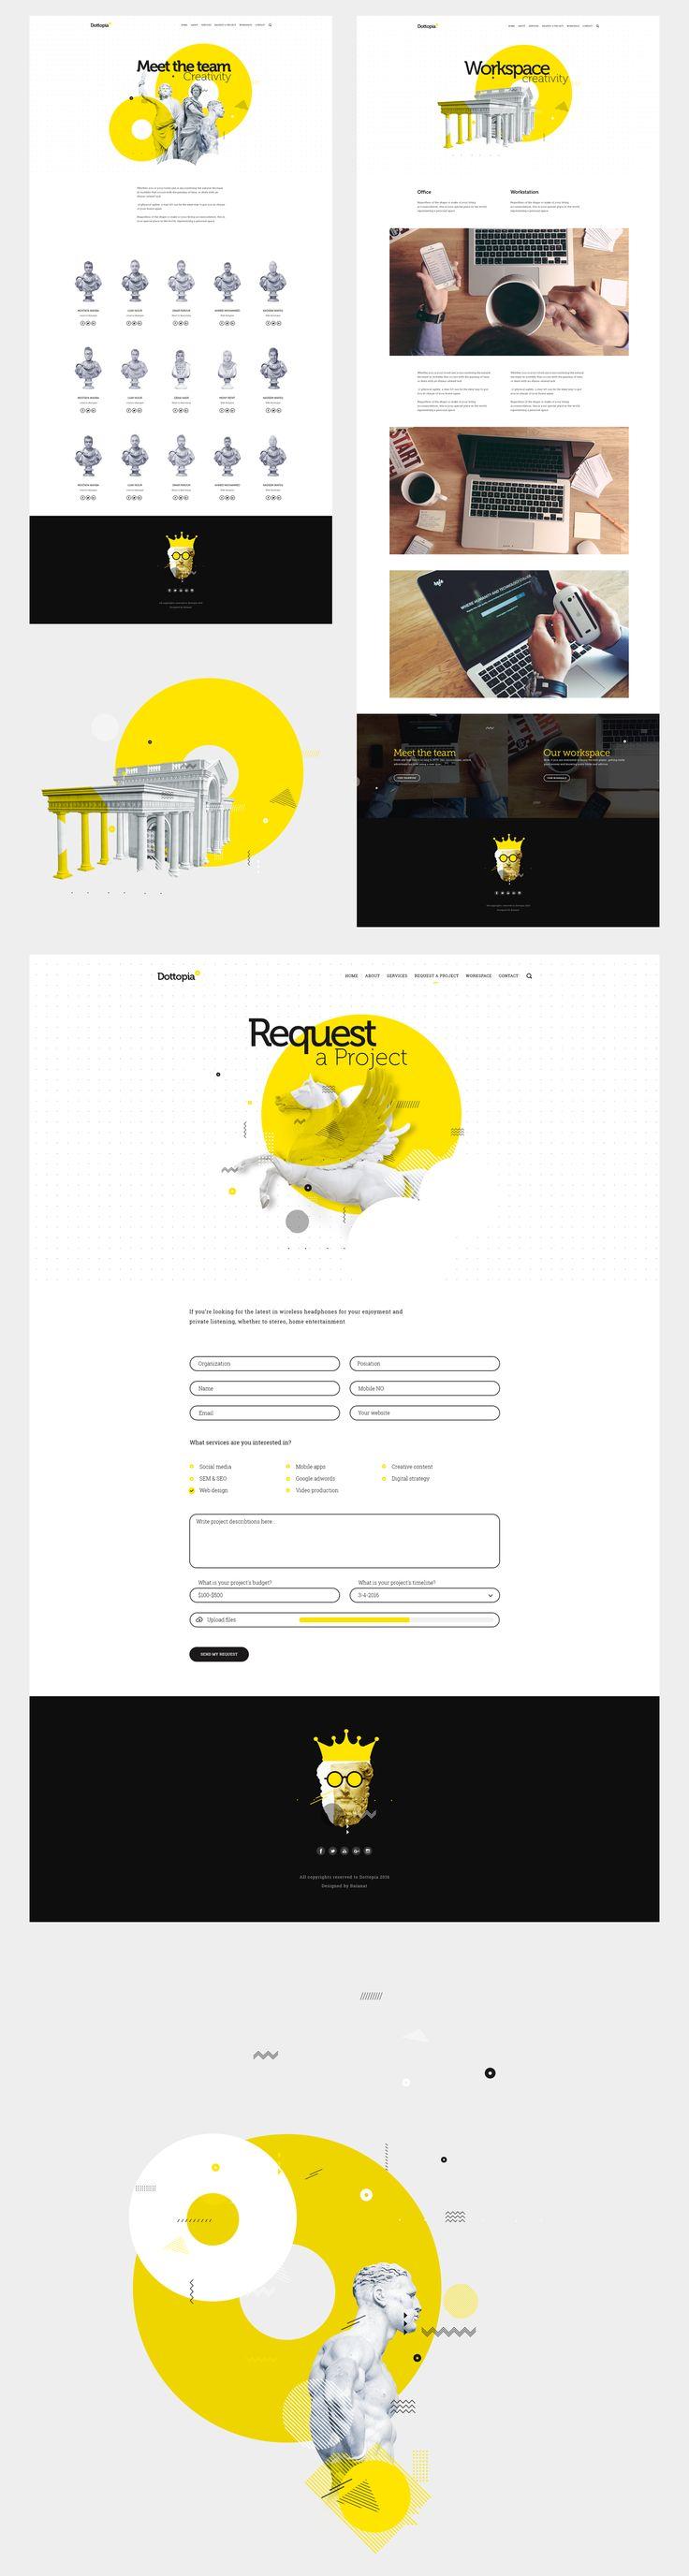 Dottopia web design UX/UI on Behance